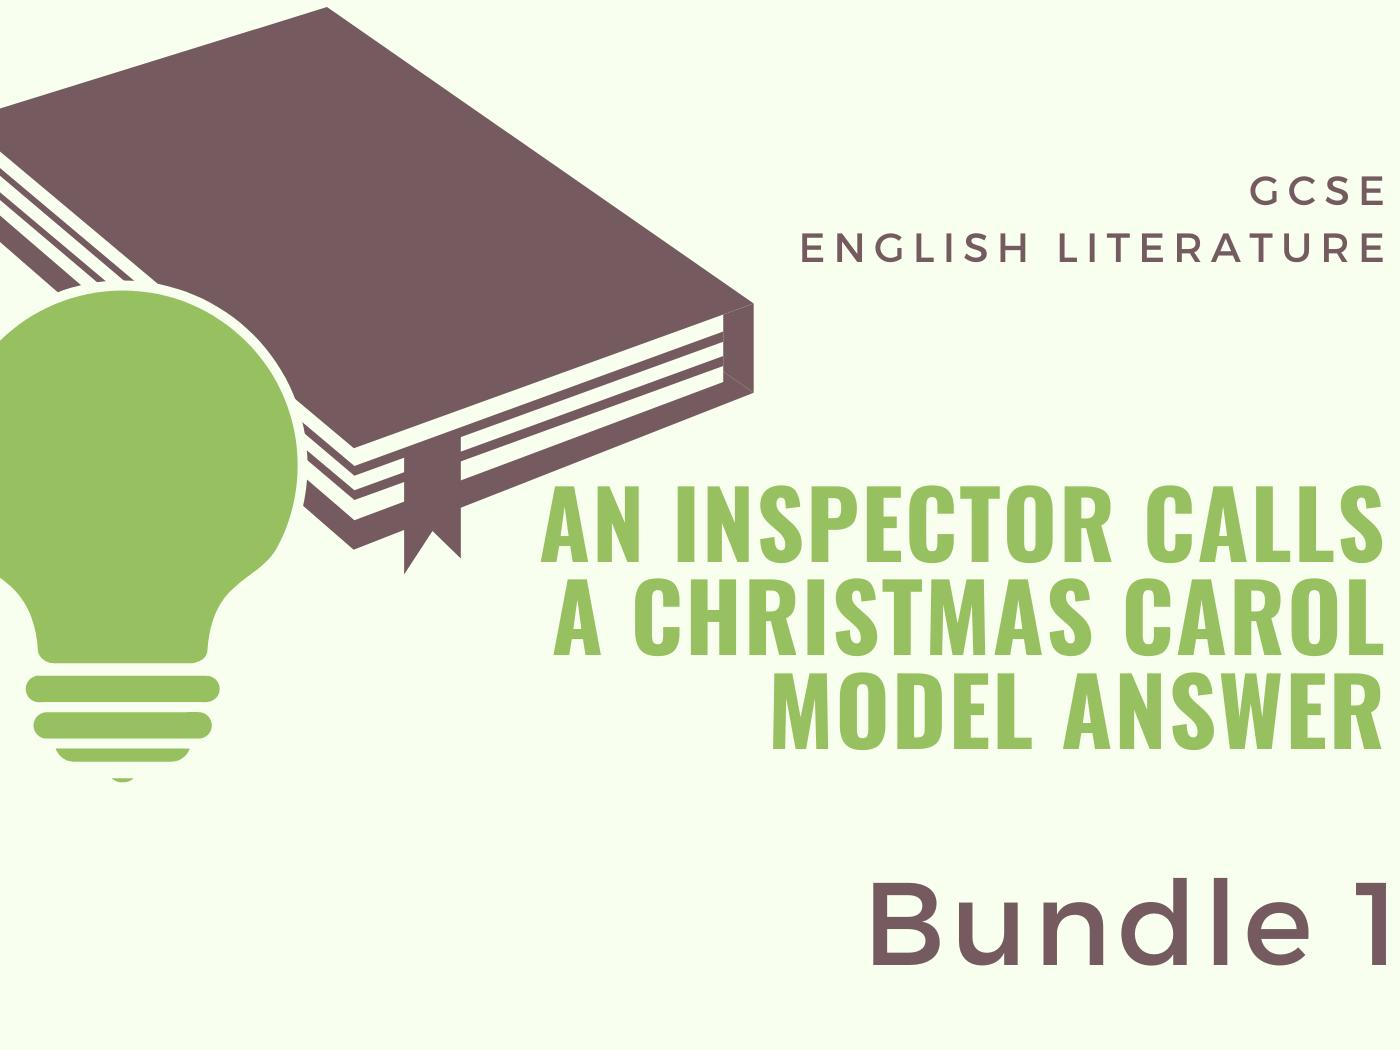 An Inspector Calls and A Christmas Carol: Model Answers - Bundle 1